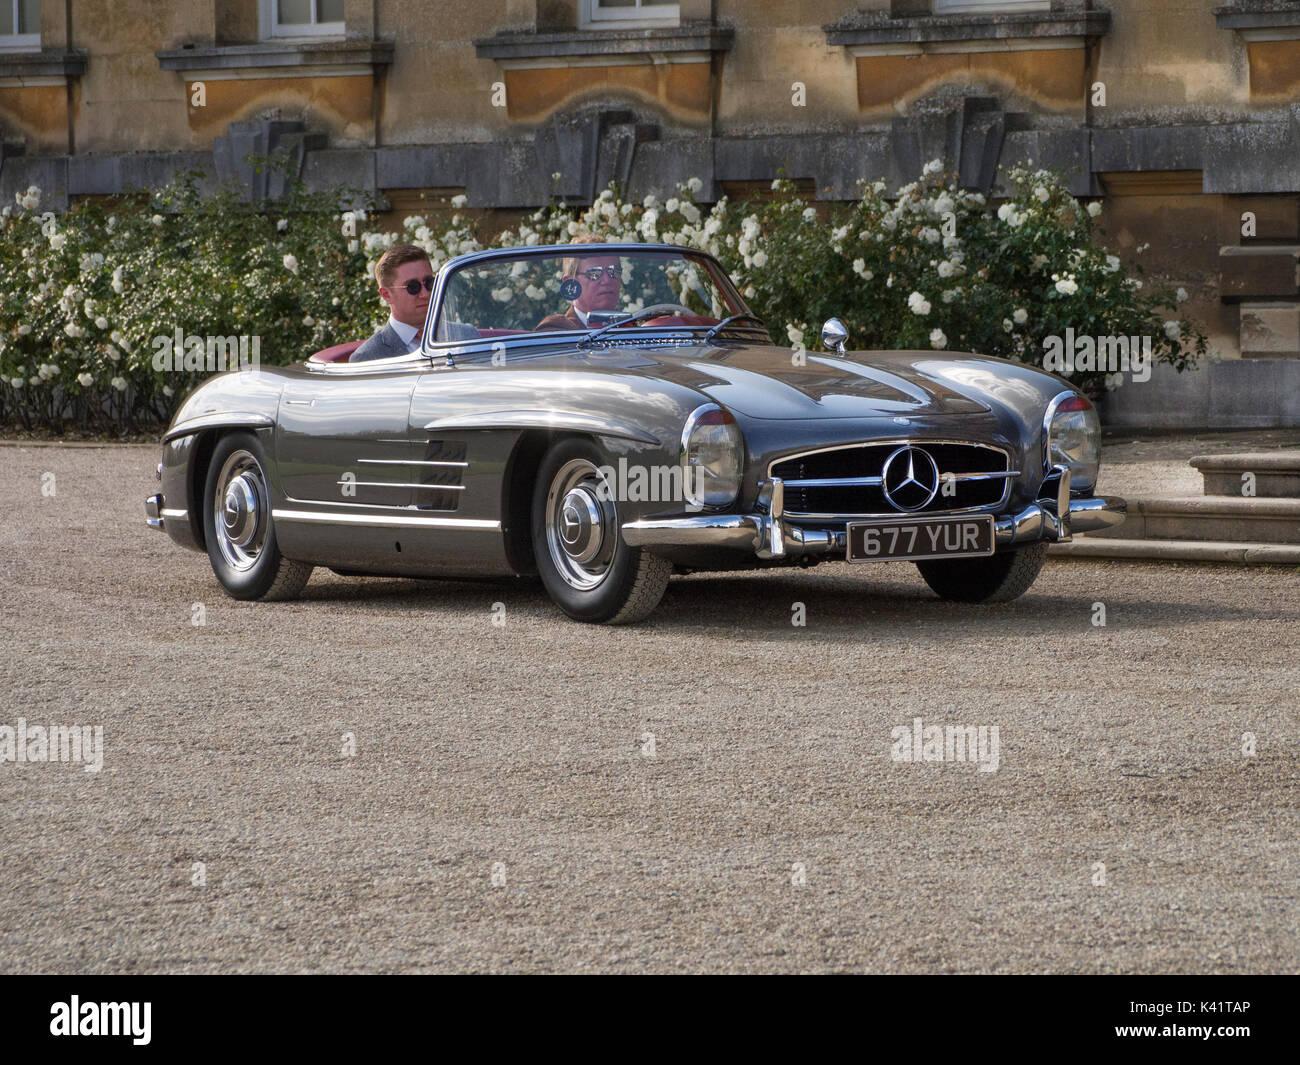 Mercedes Benz 300SL Roadster 1957 - Stock Image